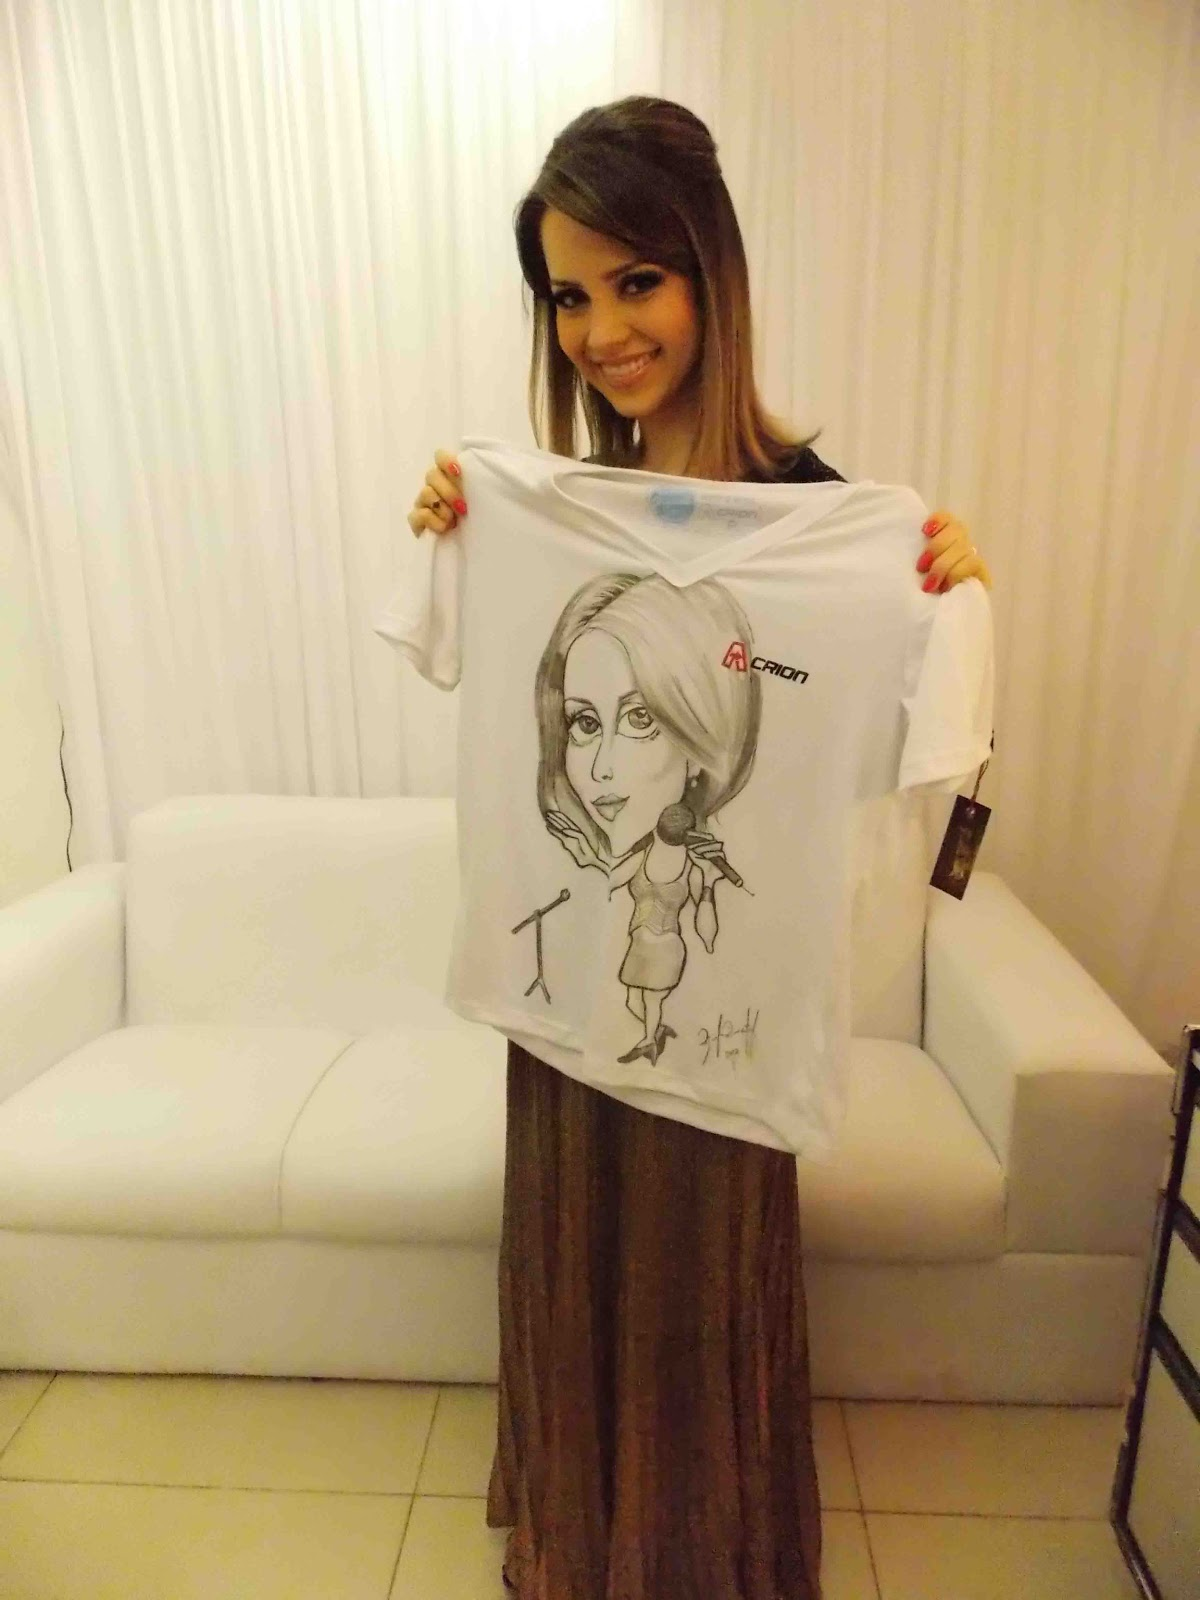 http://3.bp.blogspot.com/--Ve84nkjnuc/UL8ybJNnlpI/AAAAAAAAECU/Fo-YSANcKSY/s1600/Caricatura+na+camisa+_+cantora+Sandy+_desenhista+Priscila+Pimentel.jpg